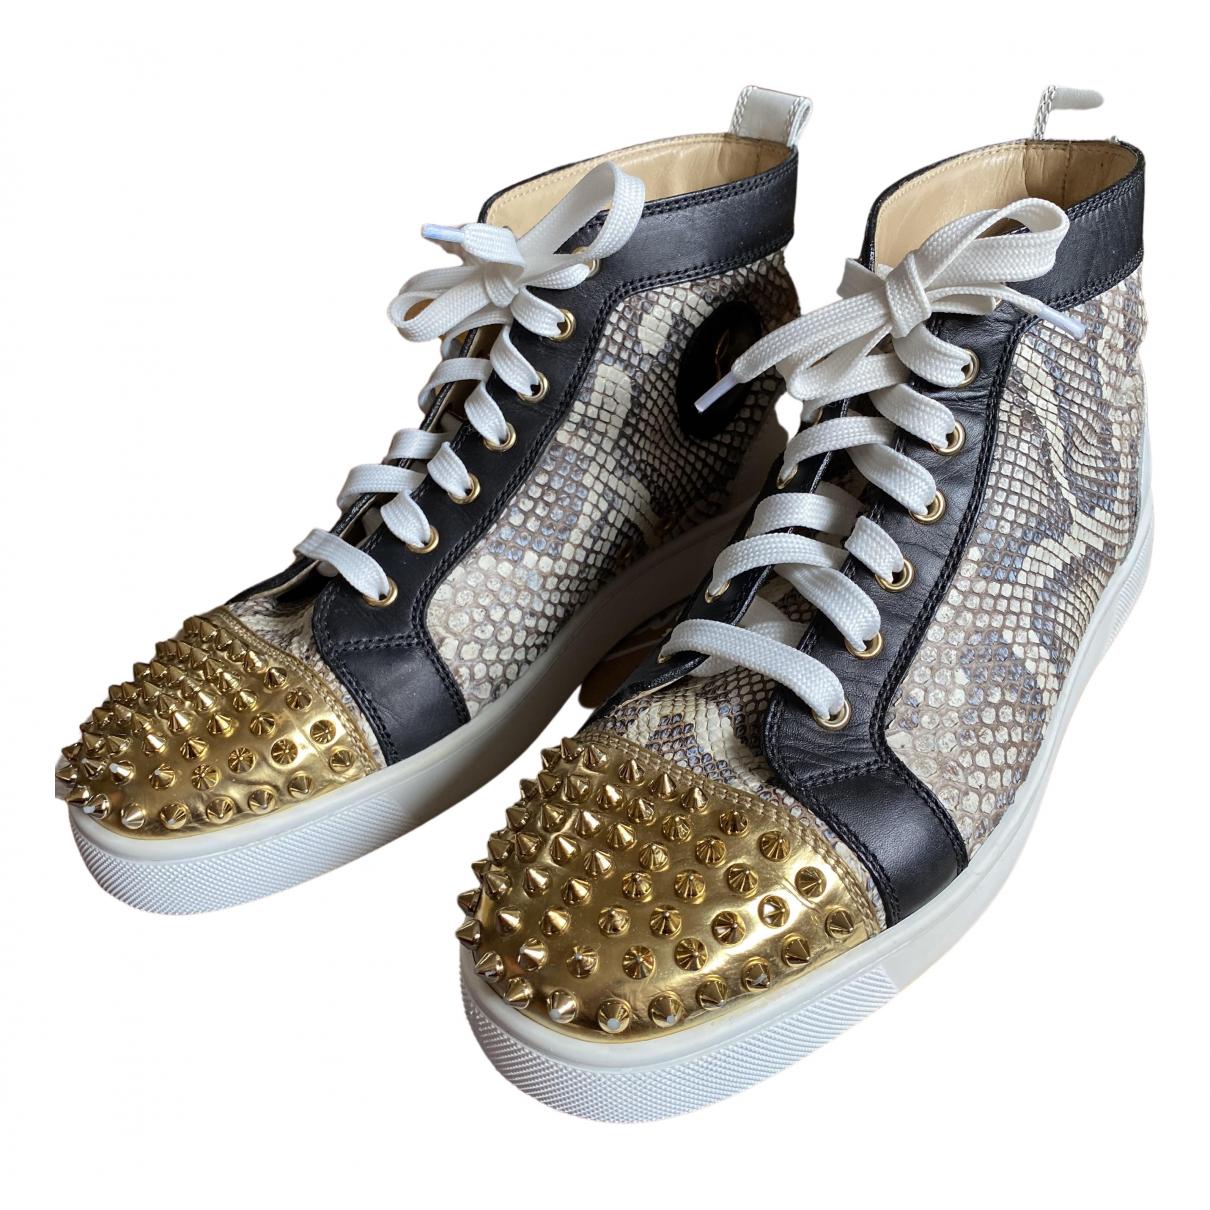 Christian Louboutin Louis Sneakers in  Beige Python